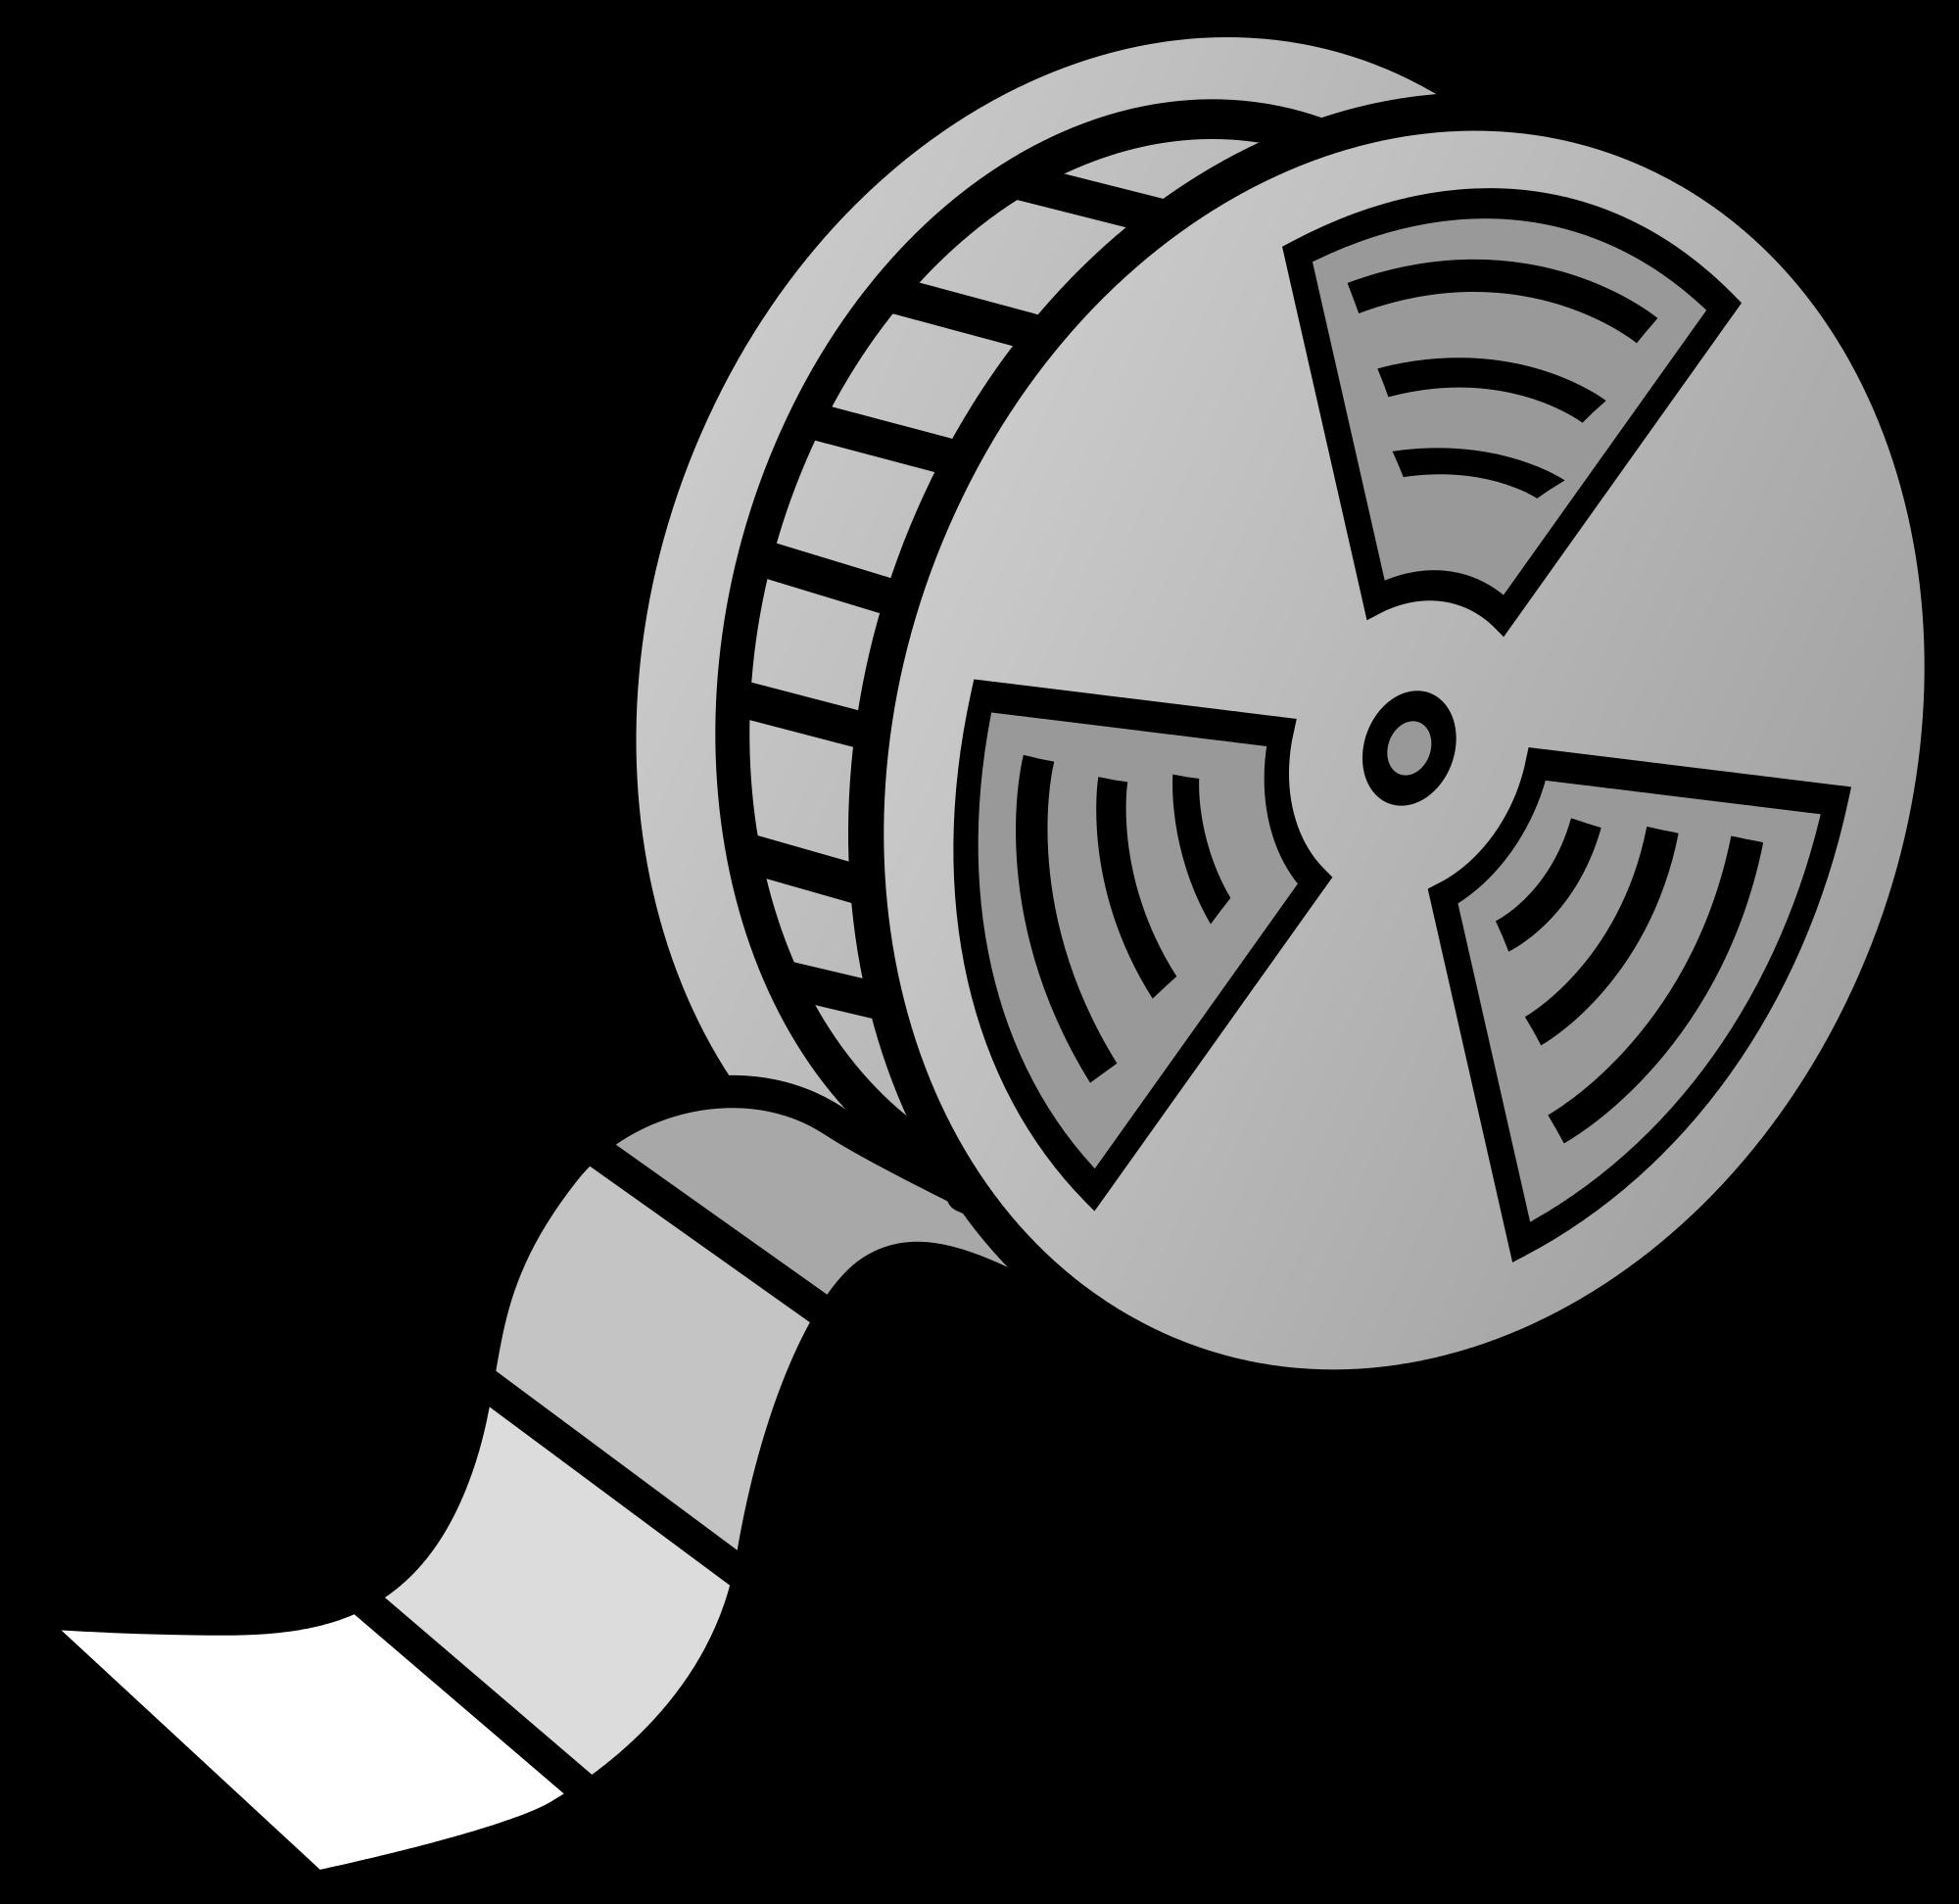 jpg library stock film drawing symbol #96599327